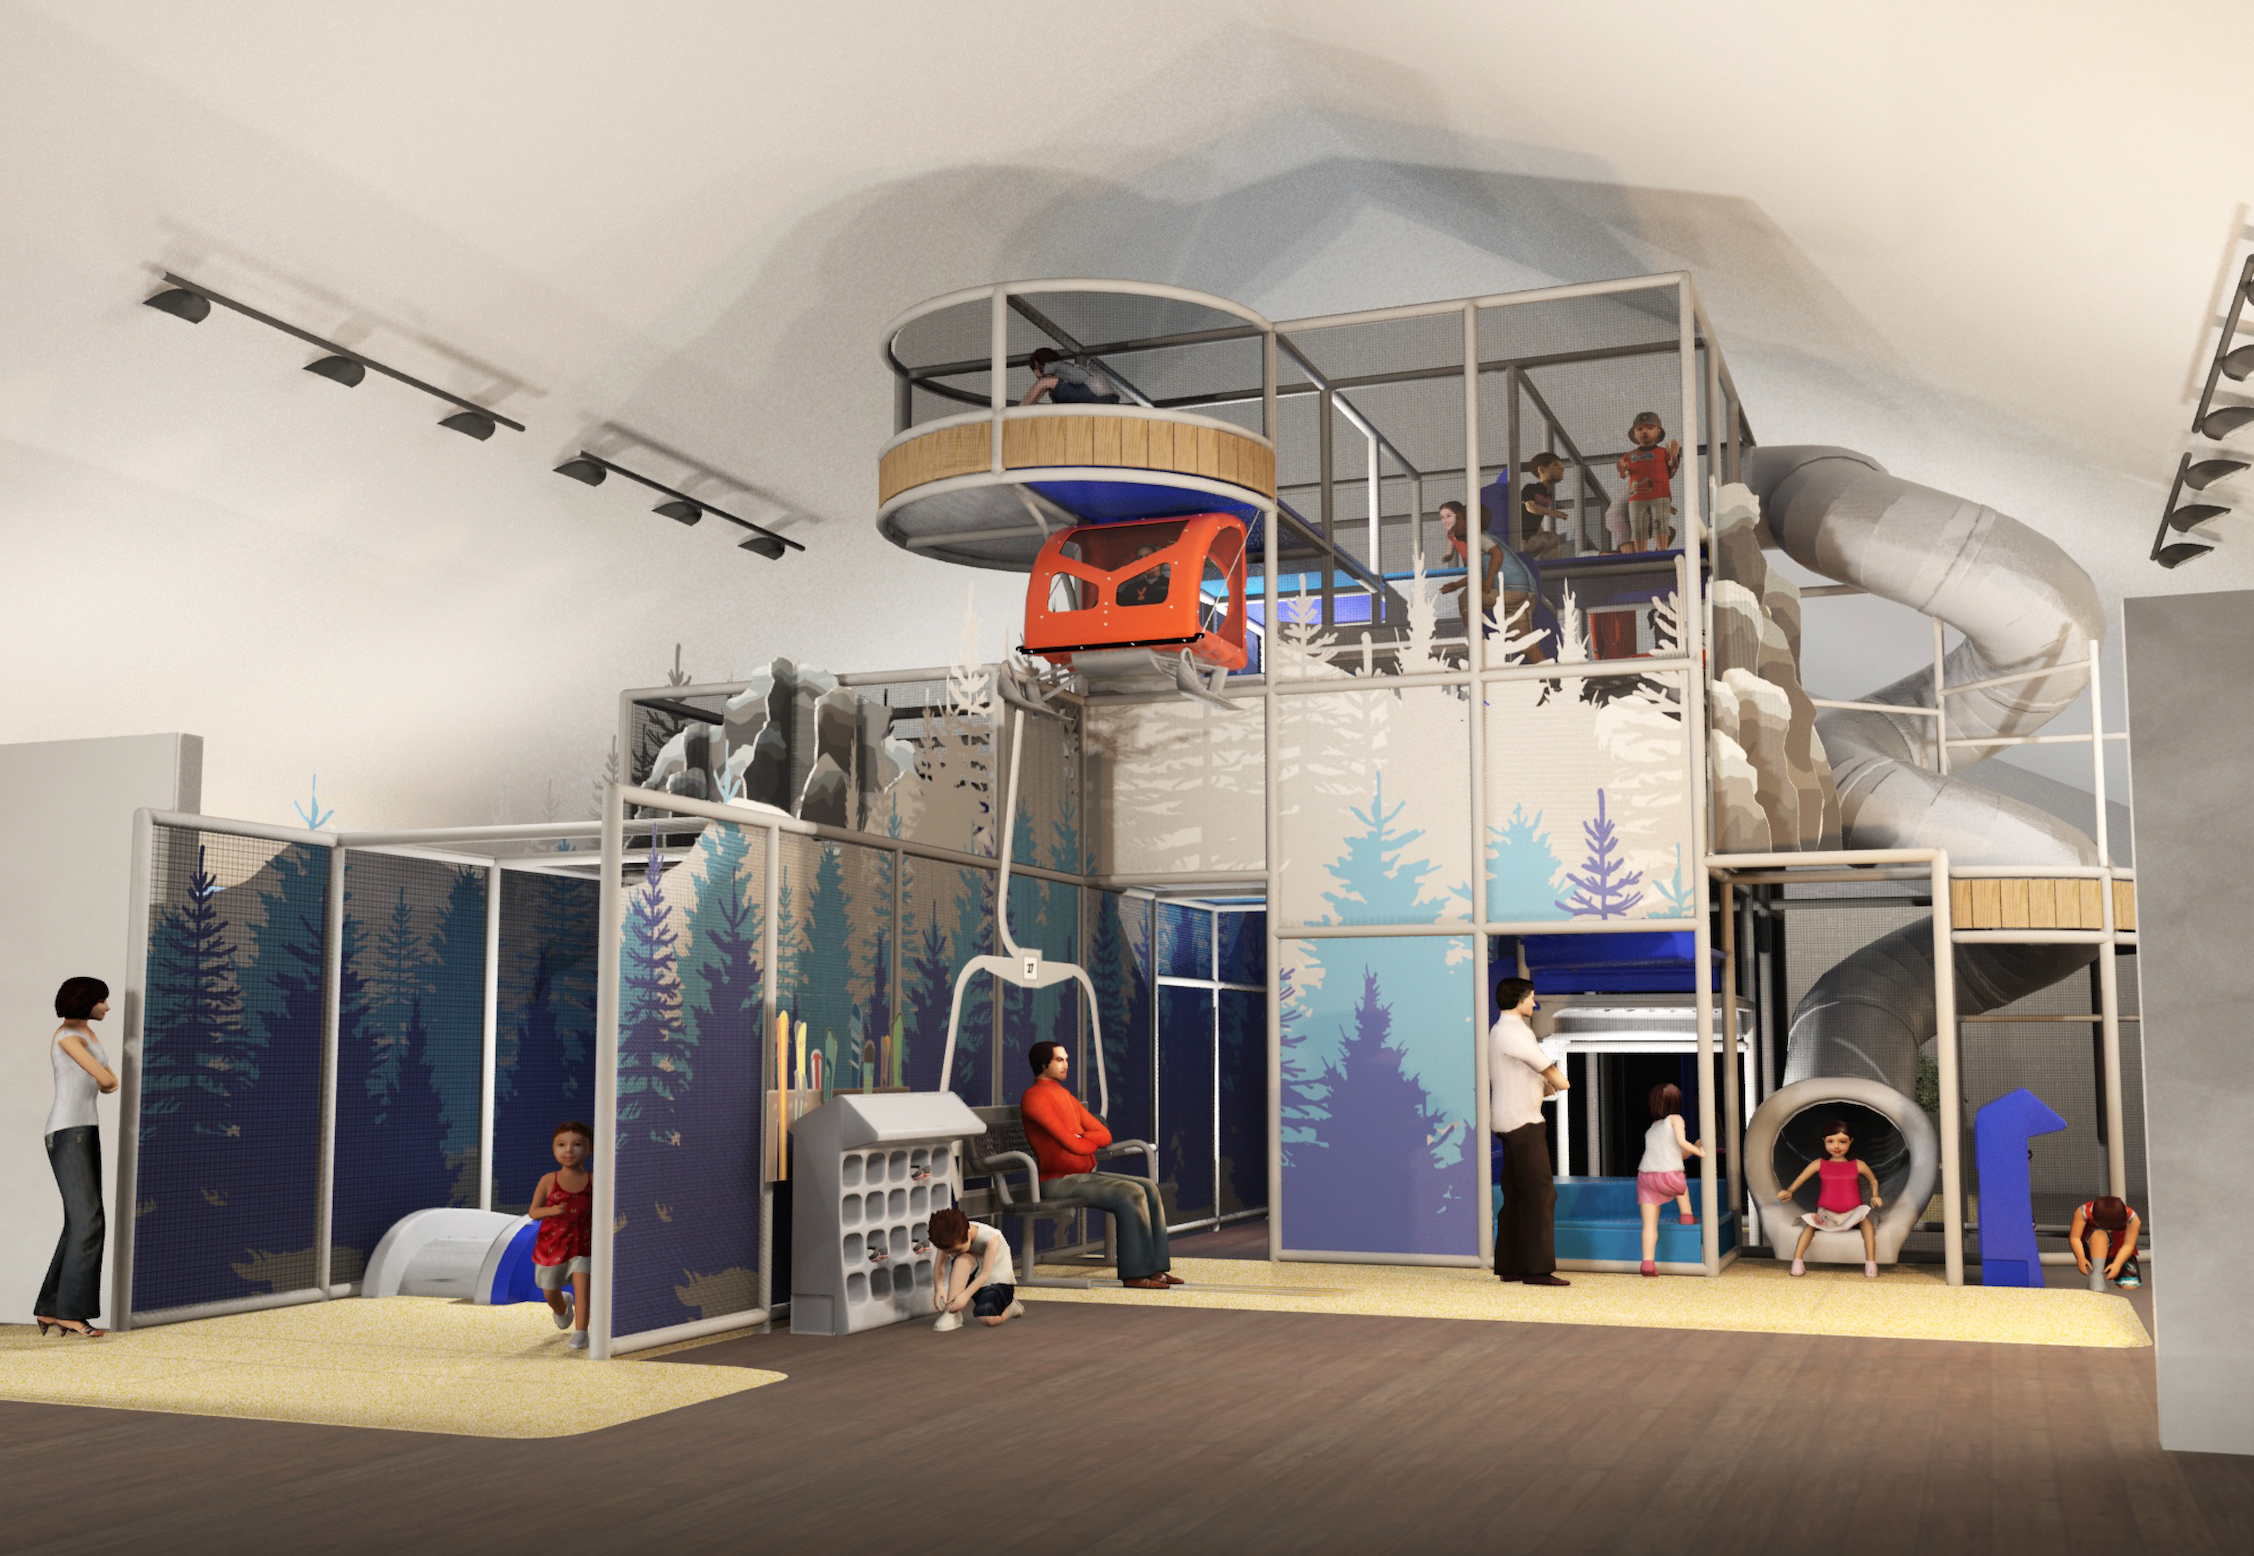 Artic play area design